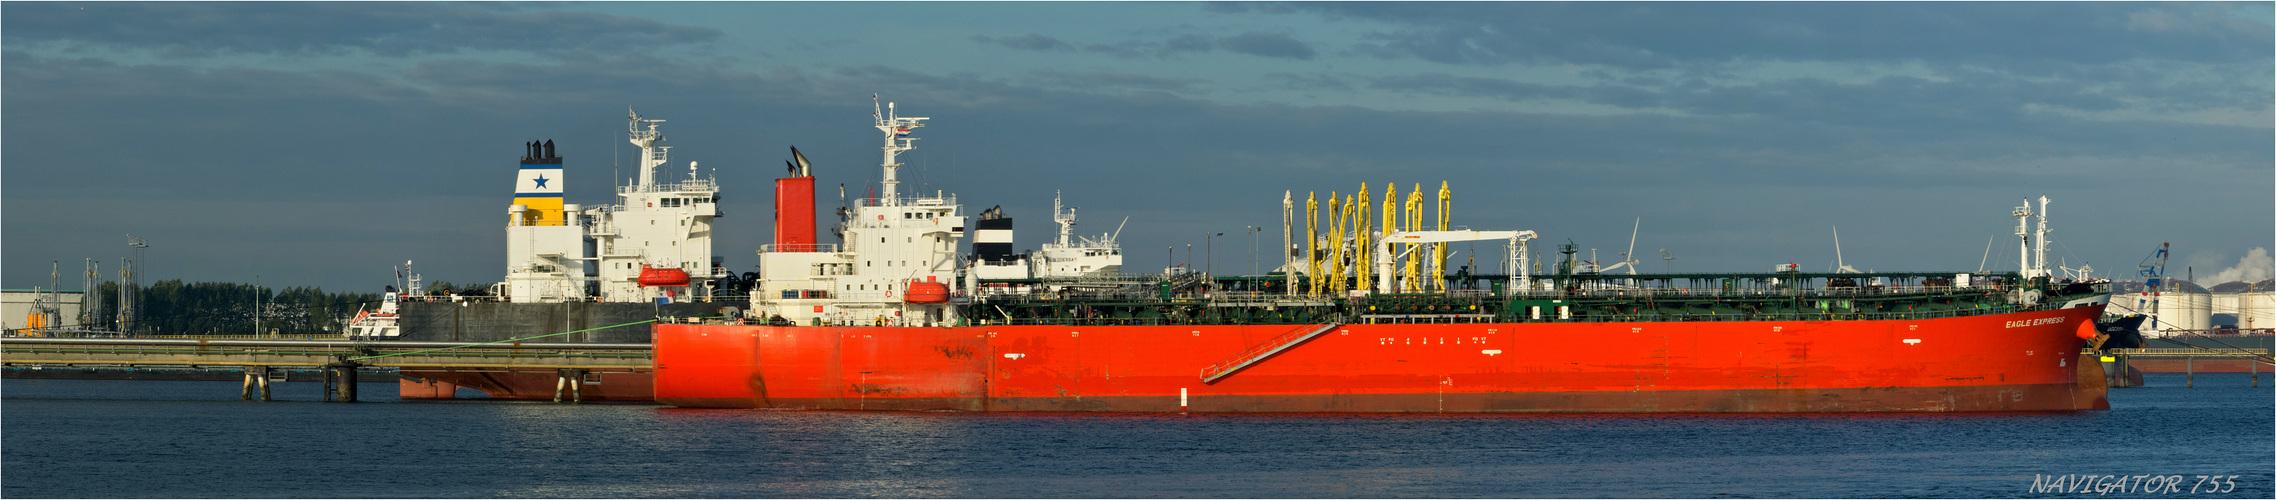 EAGLE EXPRESS /  Oil Products Tanker     /                 Bitte scrollen!